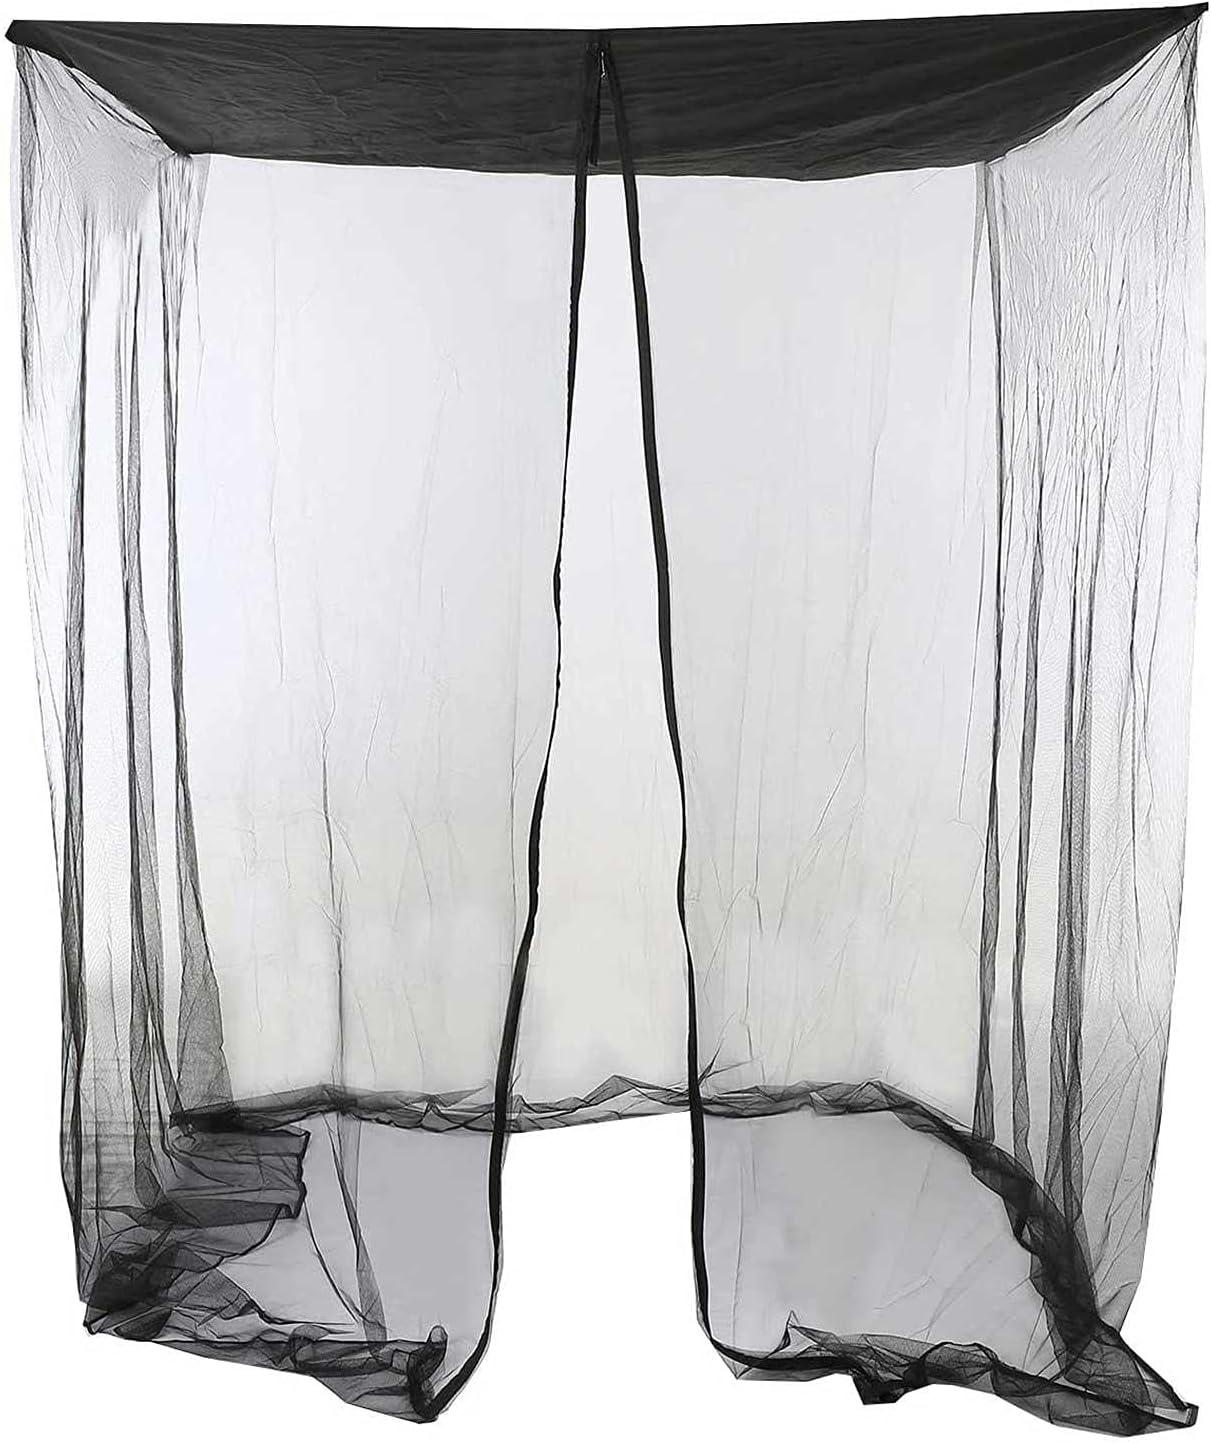 K-Park Swing Bug Netting Mesh Screen con apertura de cremallera y techo impermeable tienda rectangular cortina refinada